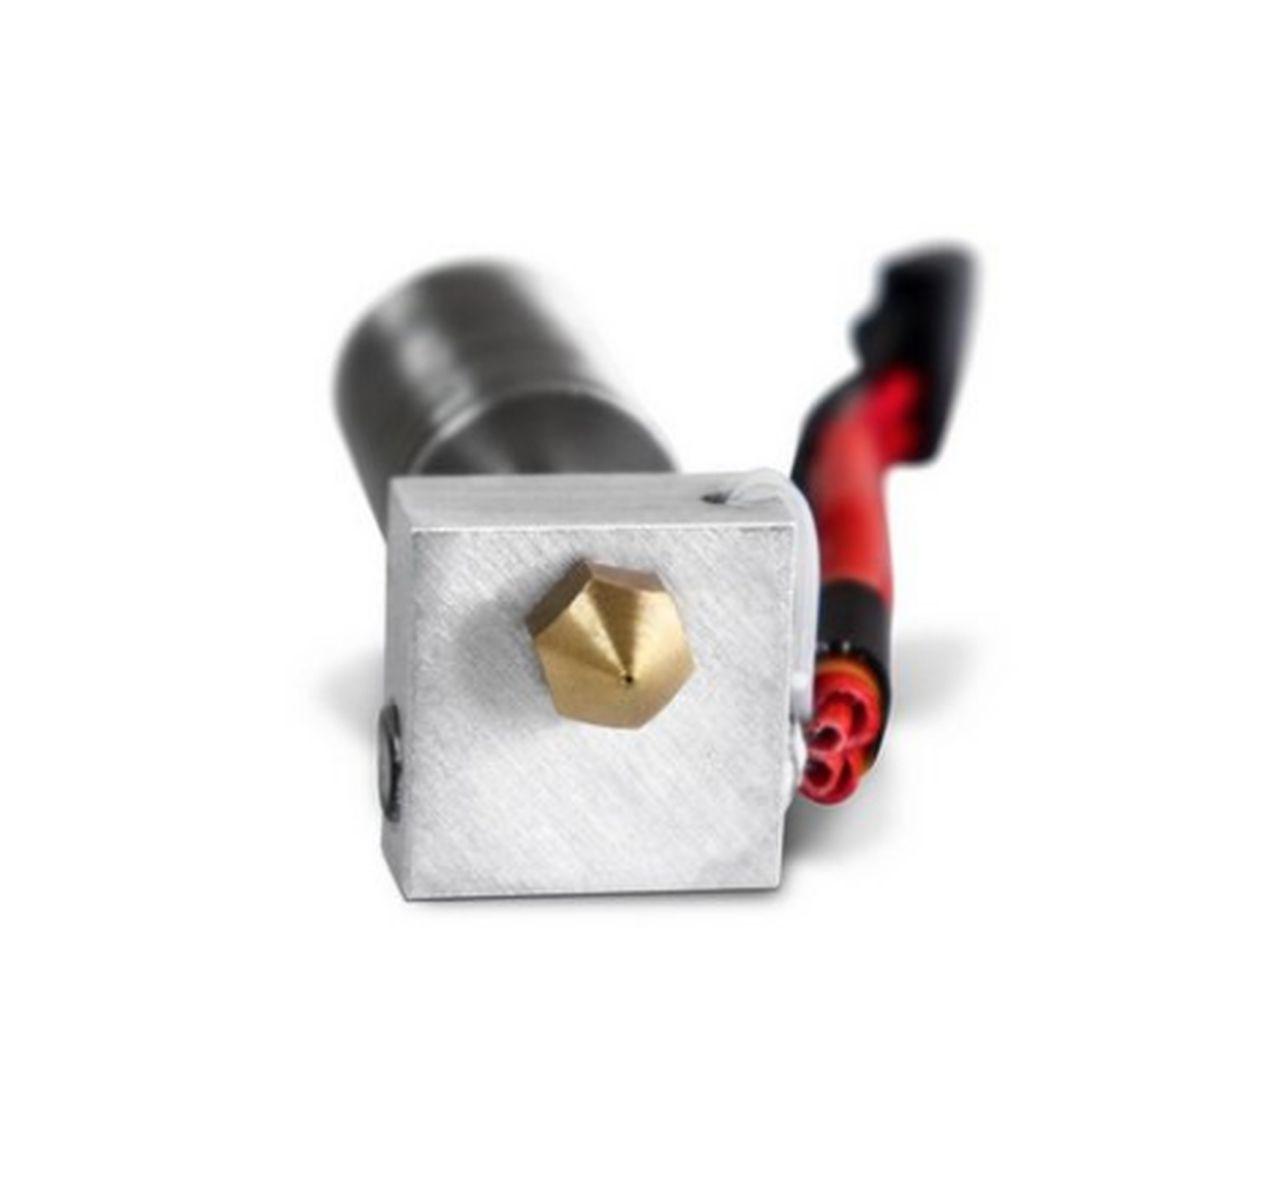 Hotend Sethi3D - S3 / S2 1.75mm (Furo 0.4mm) S3X / S4X 1.75mm (Furo 0.5mm) AiP 1.75mm (Furo 0.4mm) BB 1.75mm (Furo 0.4mm) AiP 3.00mm (Furo 0.4mm)